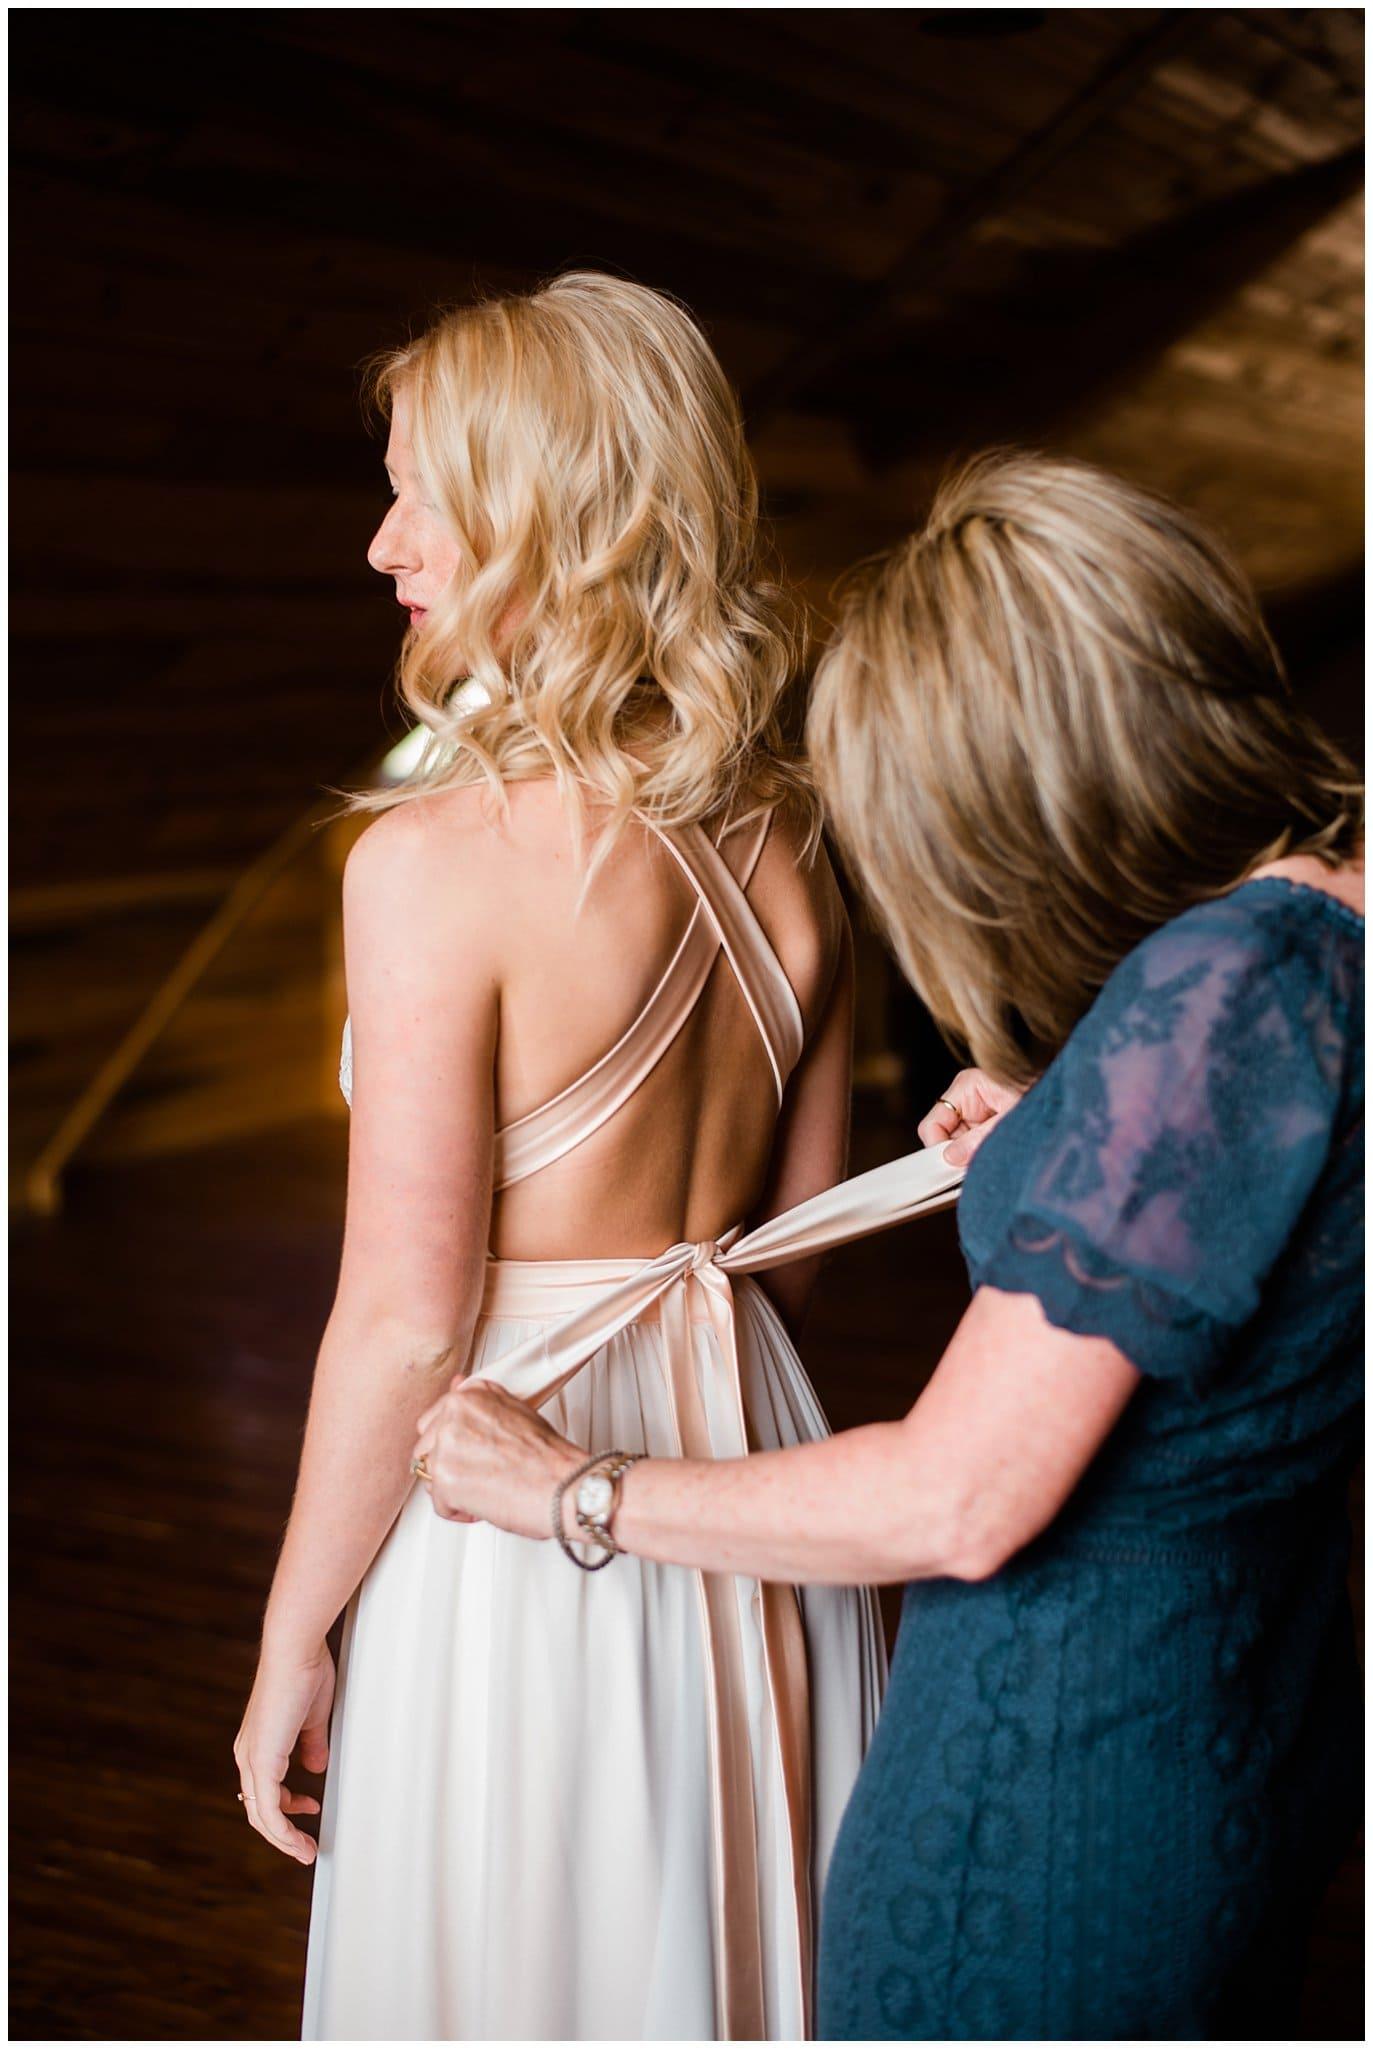 Truvelle Carrall wedding dress at Deer Creek Valley Ranch wedding by Denver Wedding Photographer Jennie Crate Photographer